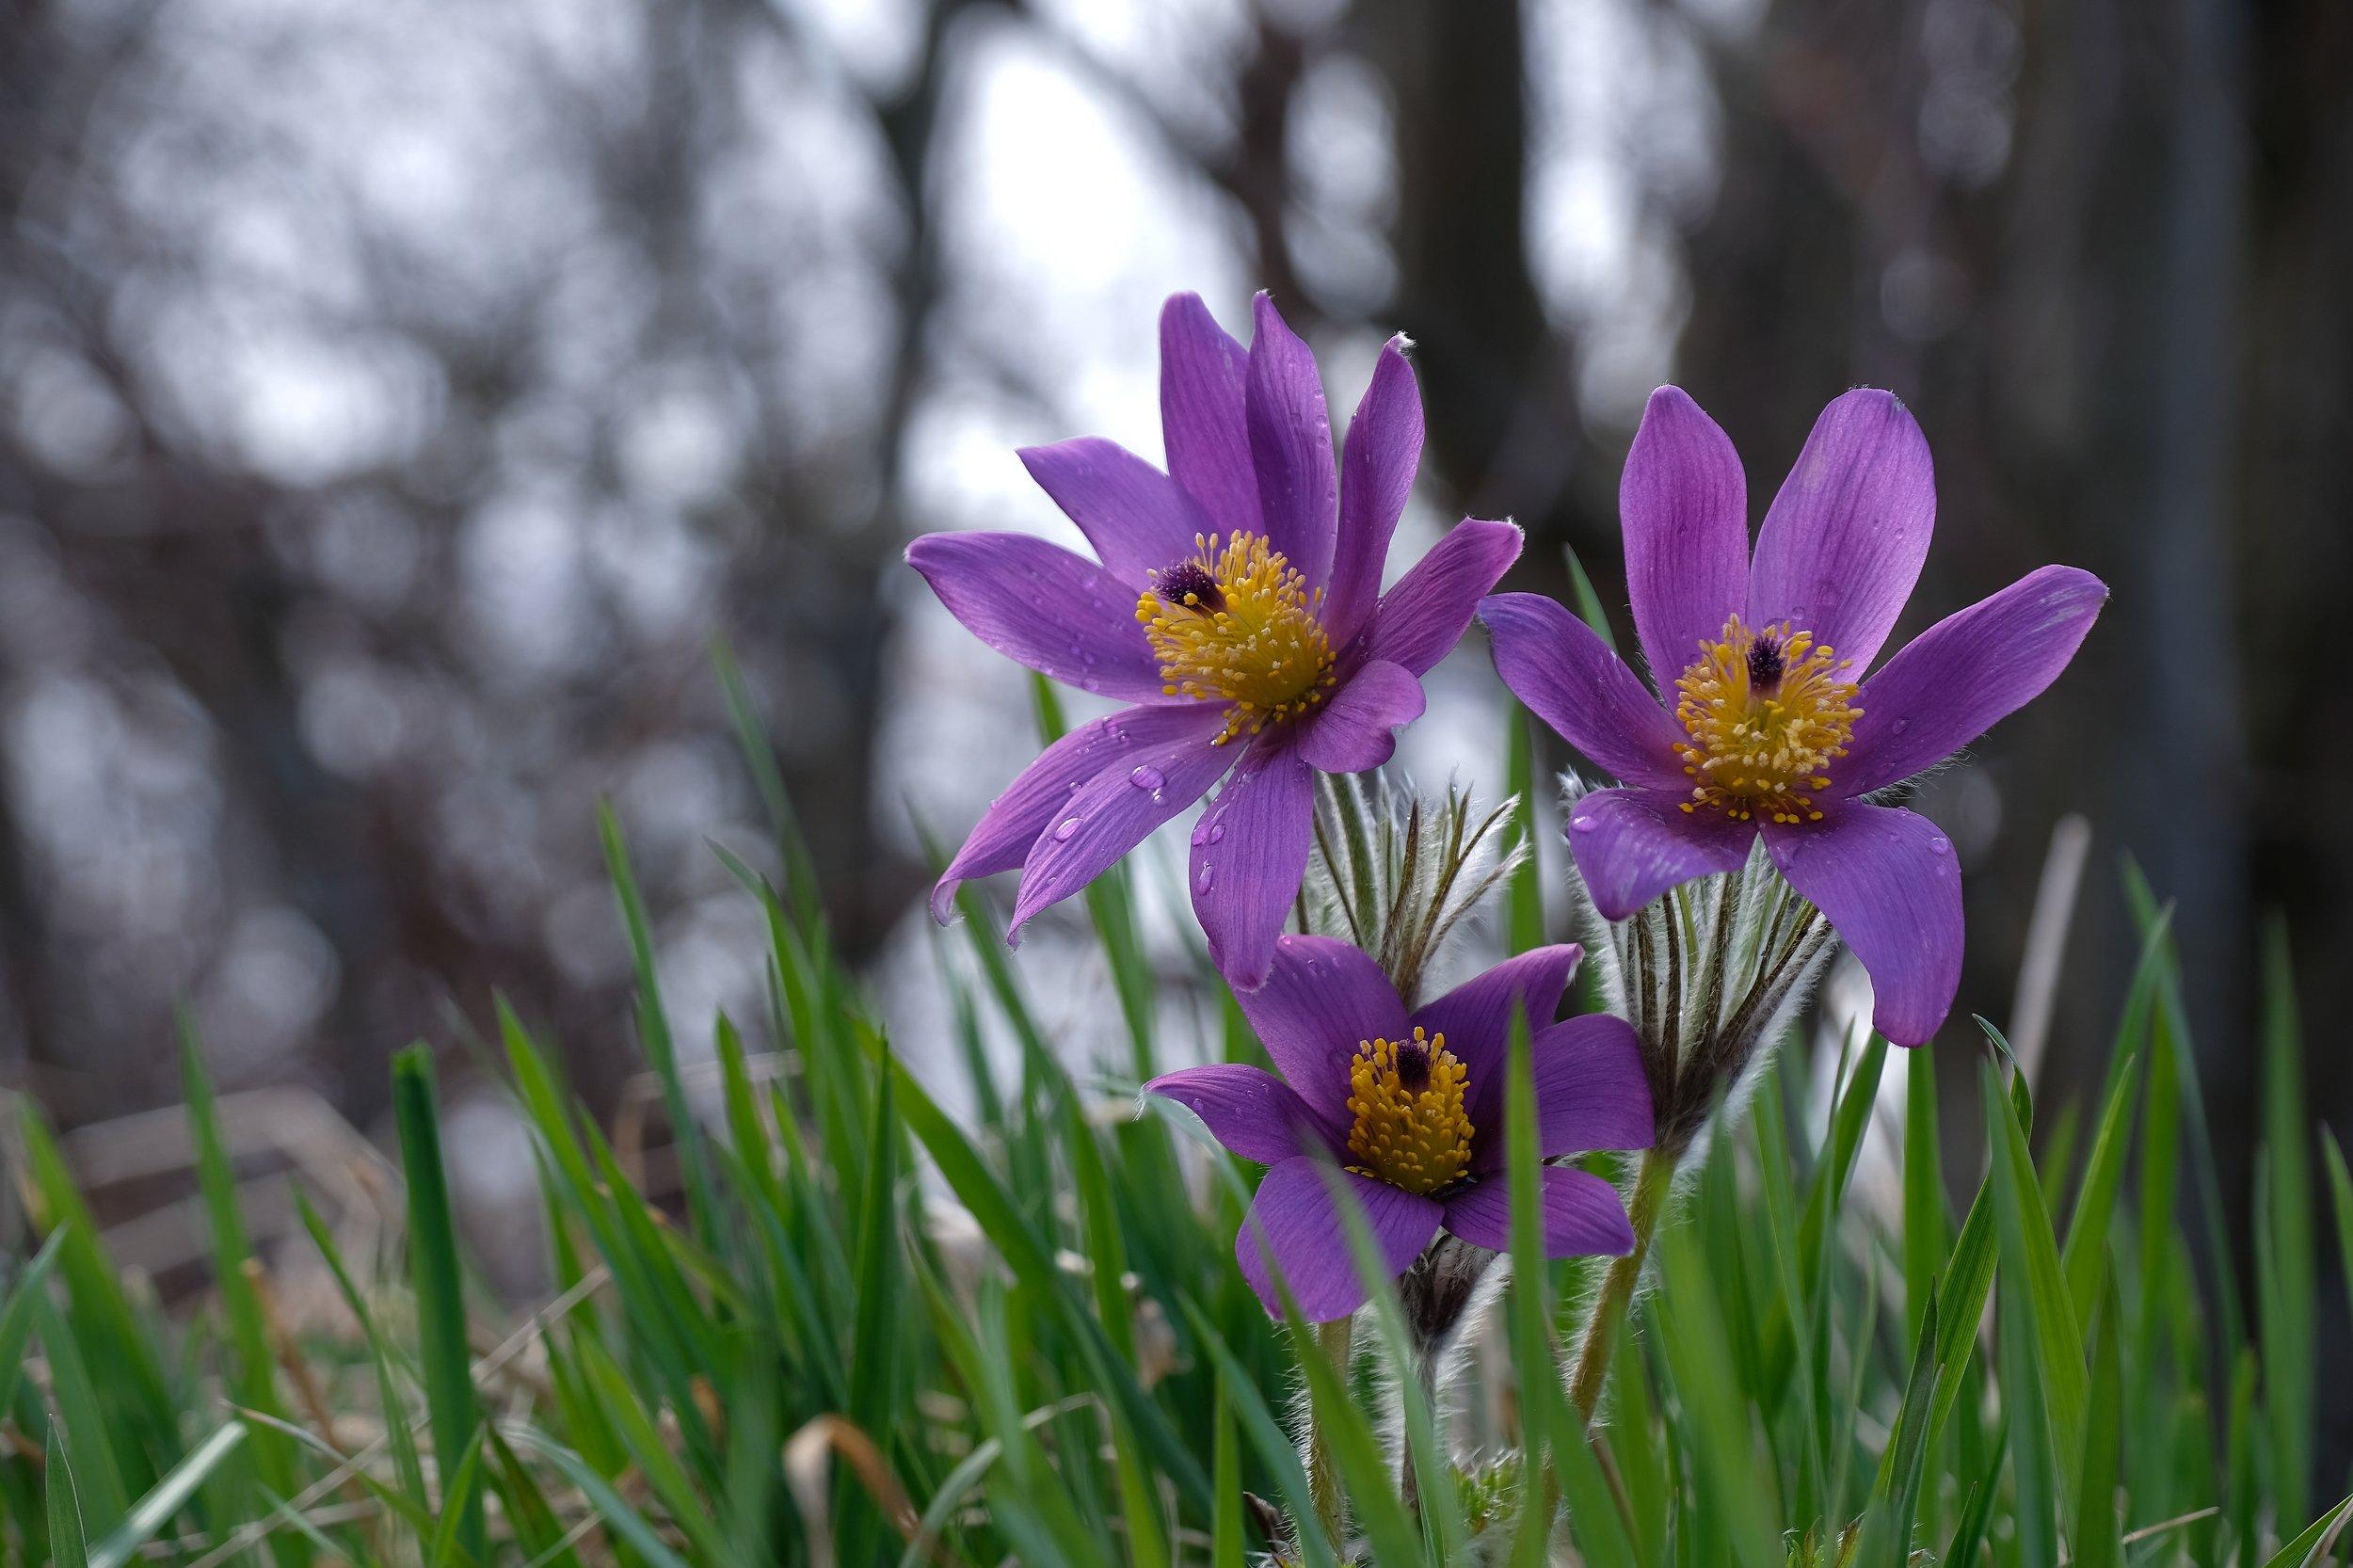 macro, flowers, floral, spring, pulsatilla patens, cutler anemone, norway, nature, purple, forest, water drops,, Povarova Ree Svetlana